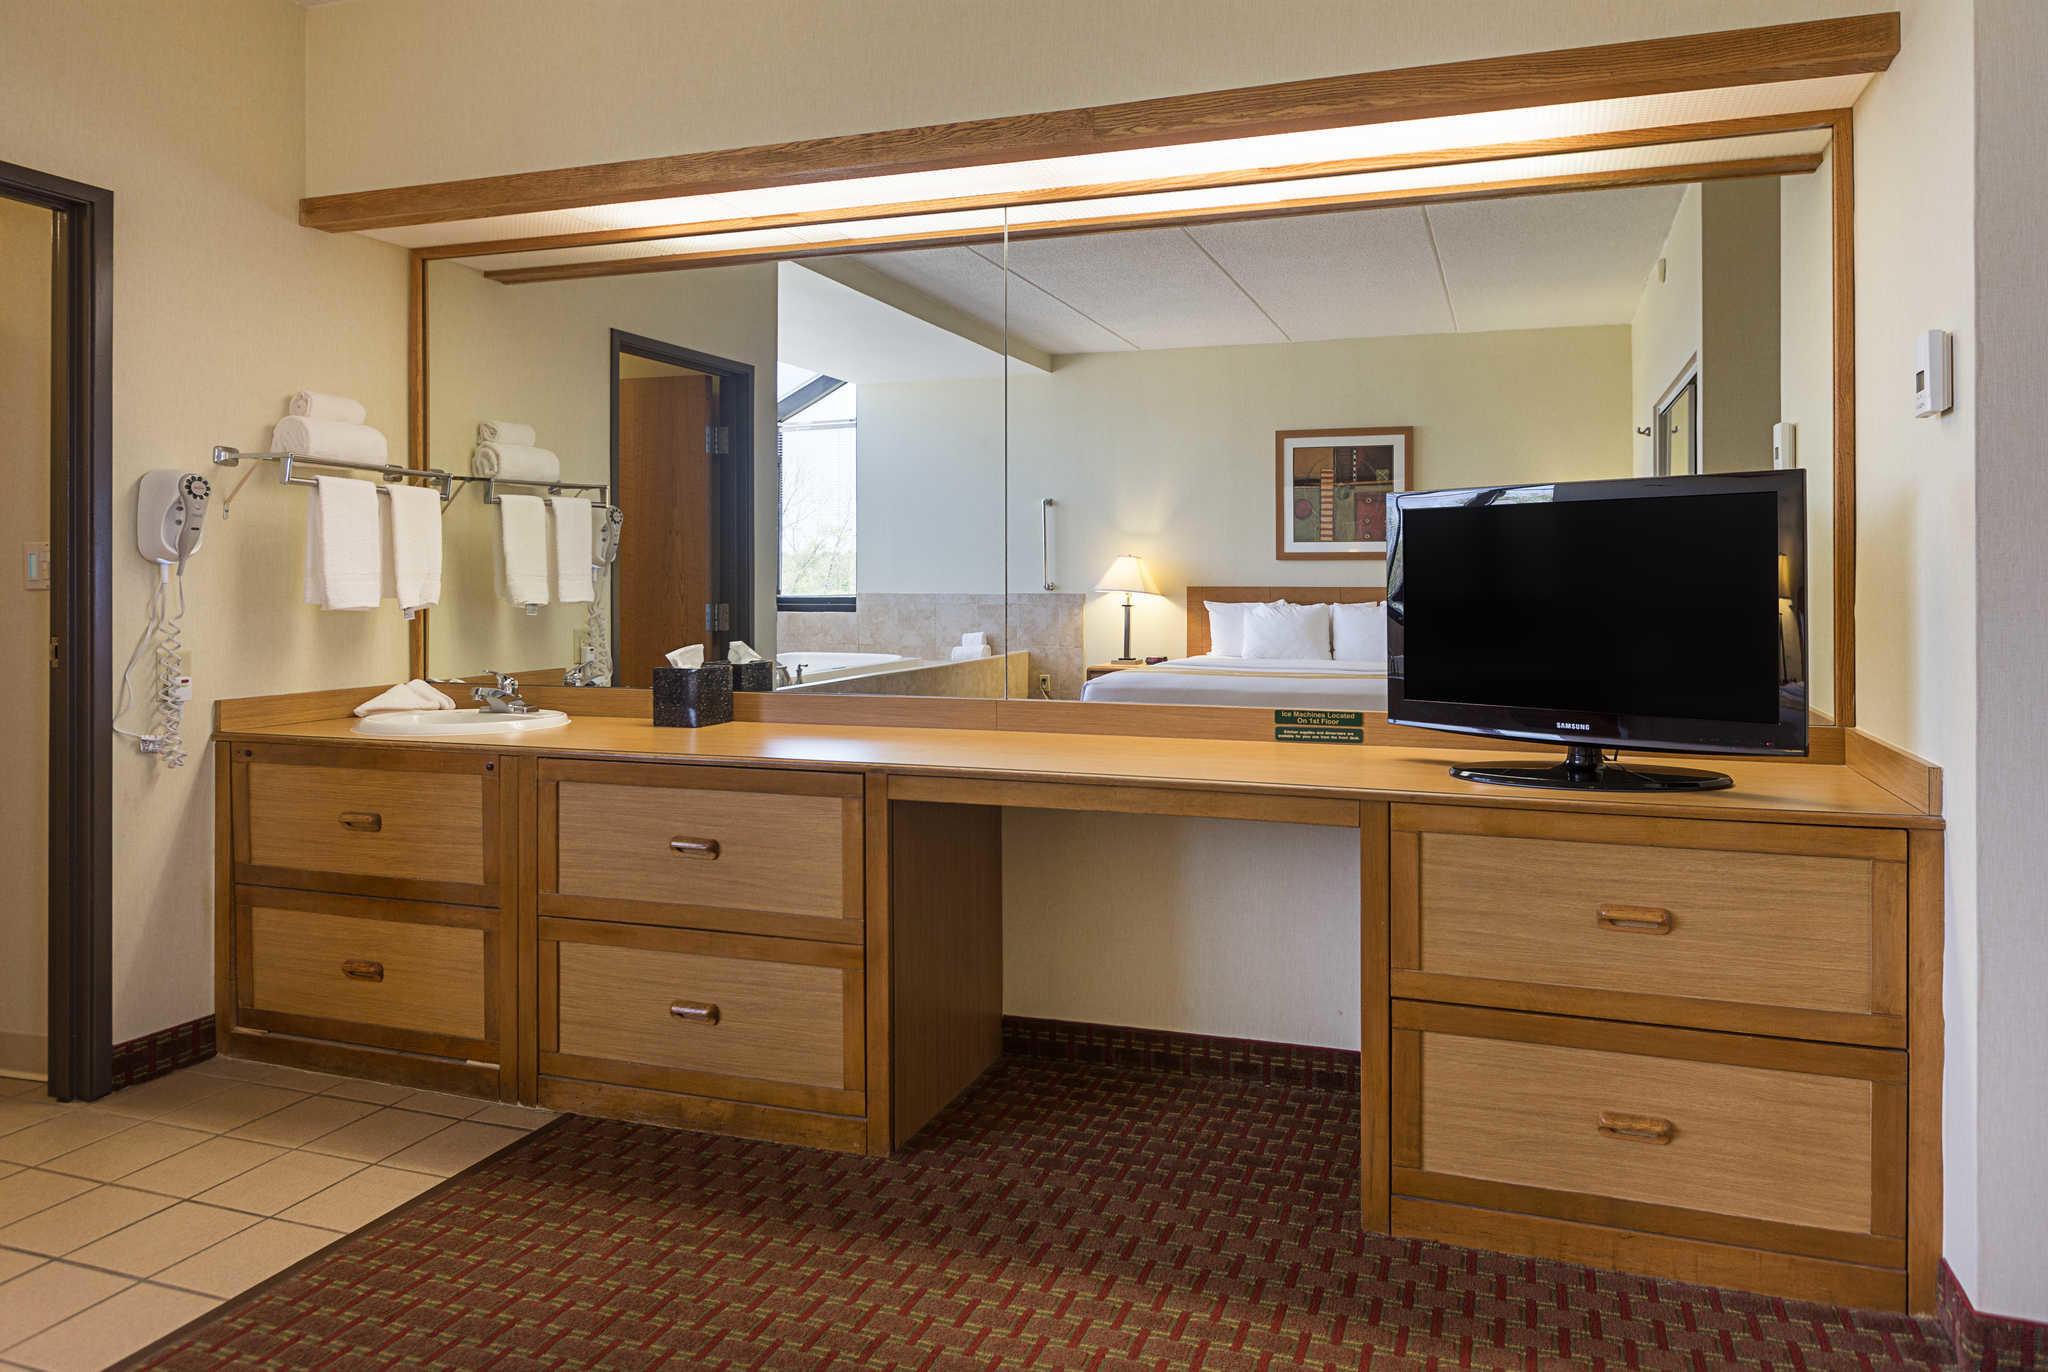 Quality Suites image 26